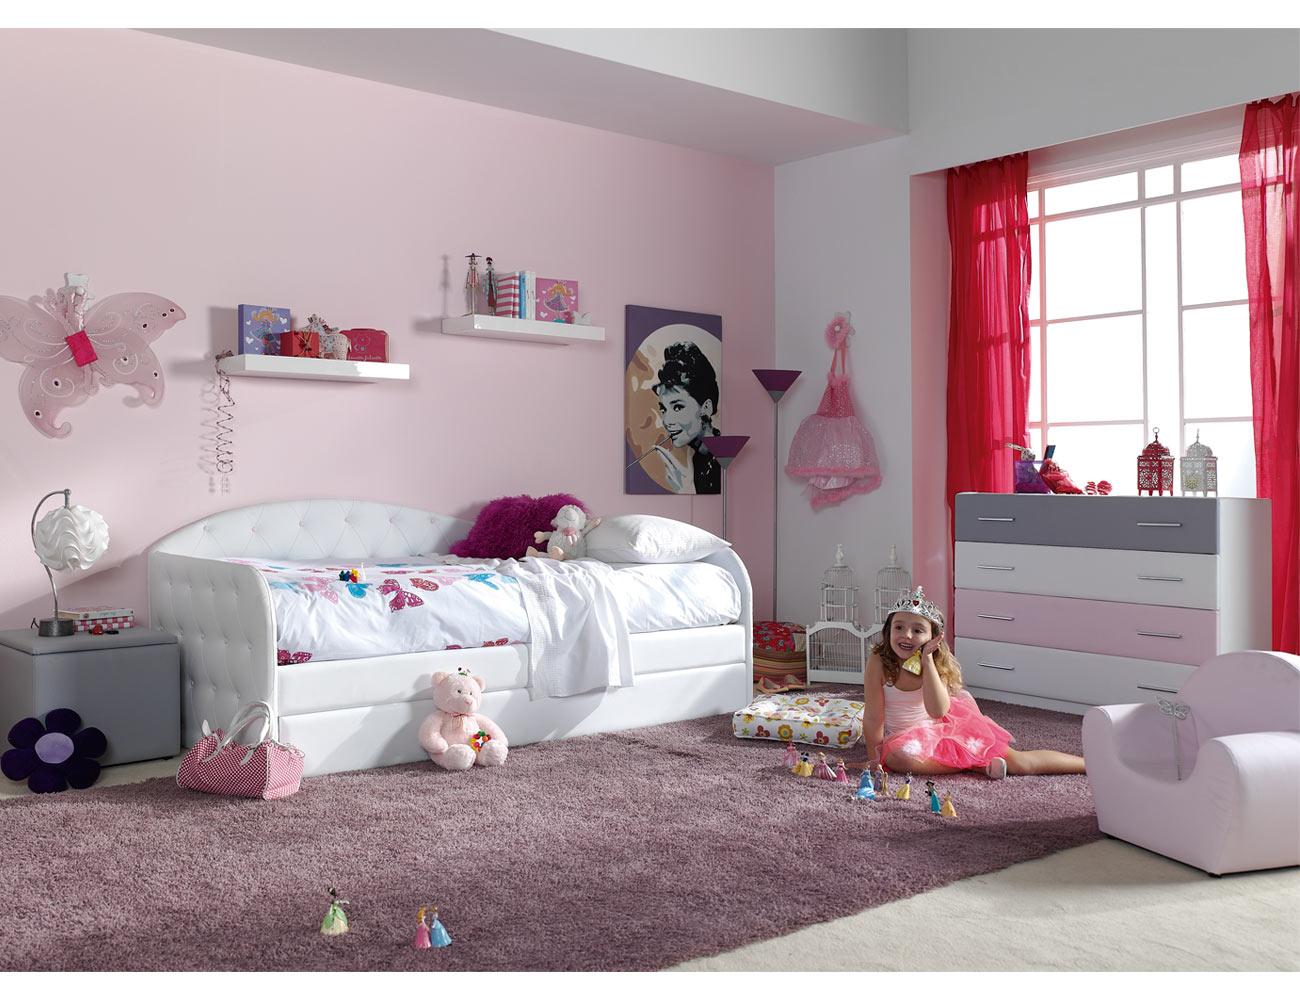 243 cama nido18